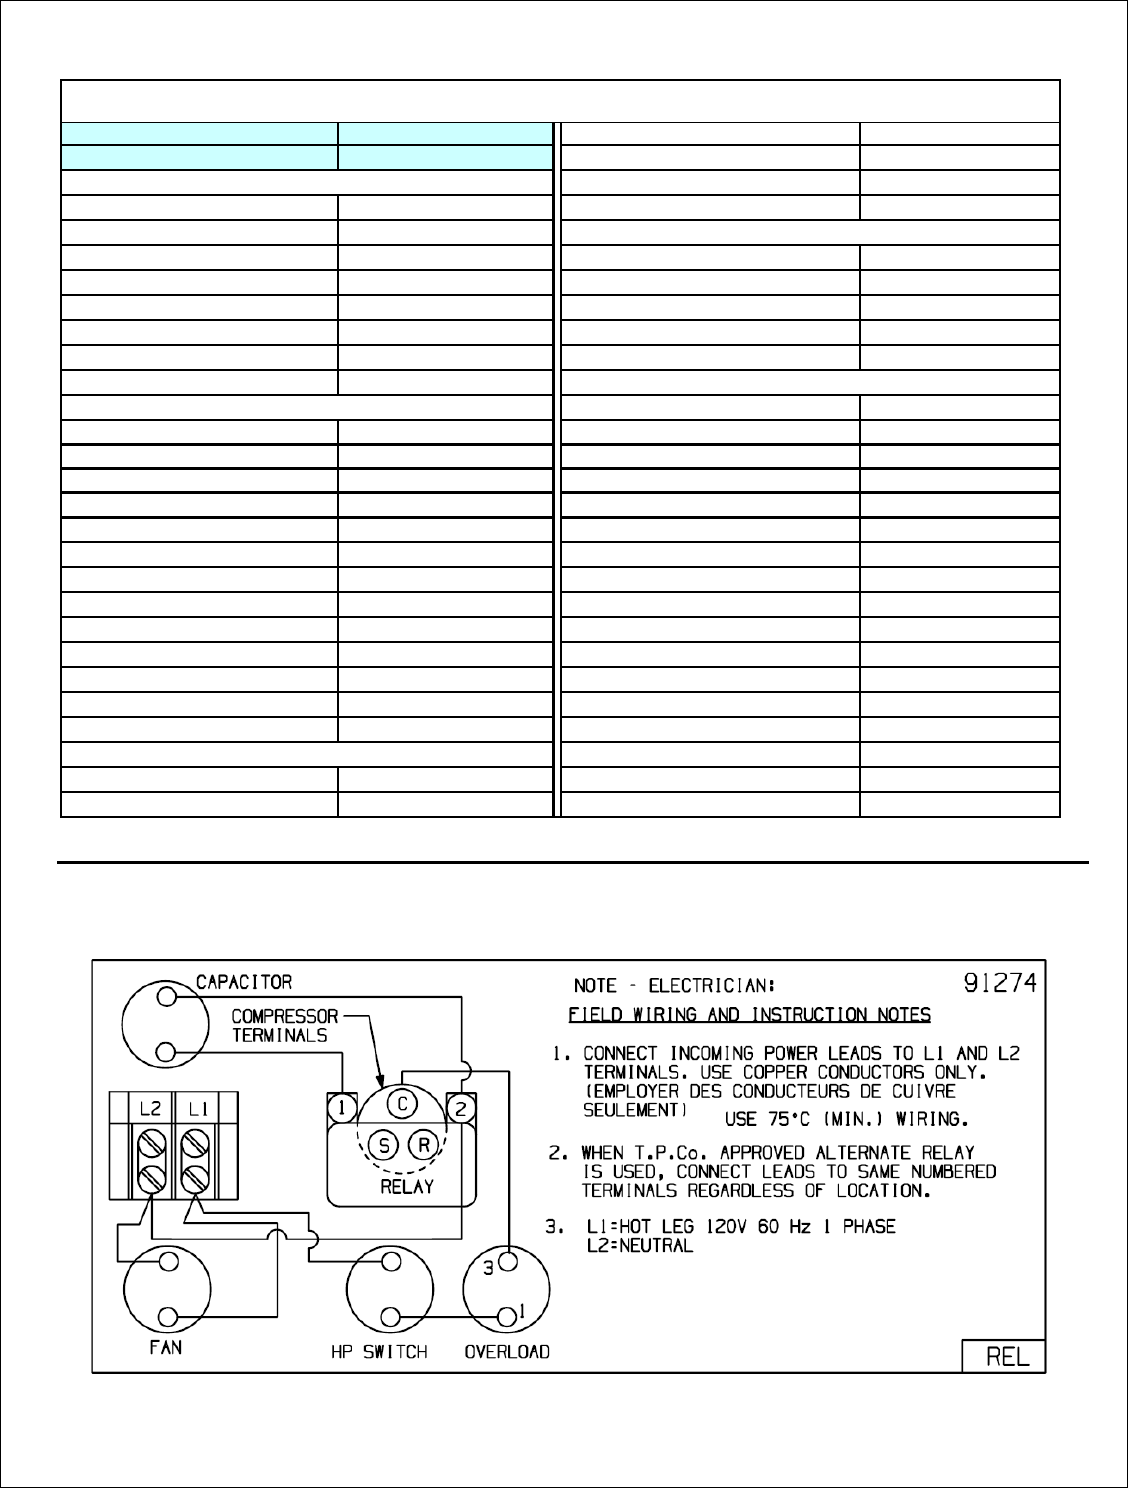 Tecumseh Ae4440u Aa1ack Performance Data Sheet 32g365 39s Rel Alternating Relay Switch Circuit Schematic Diagram Unit Bom Condenser 506 G434